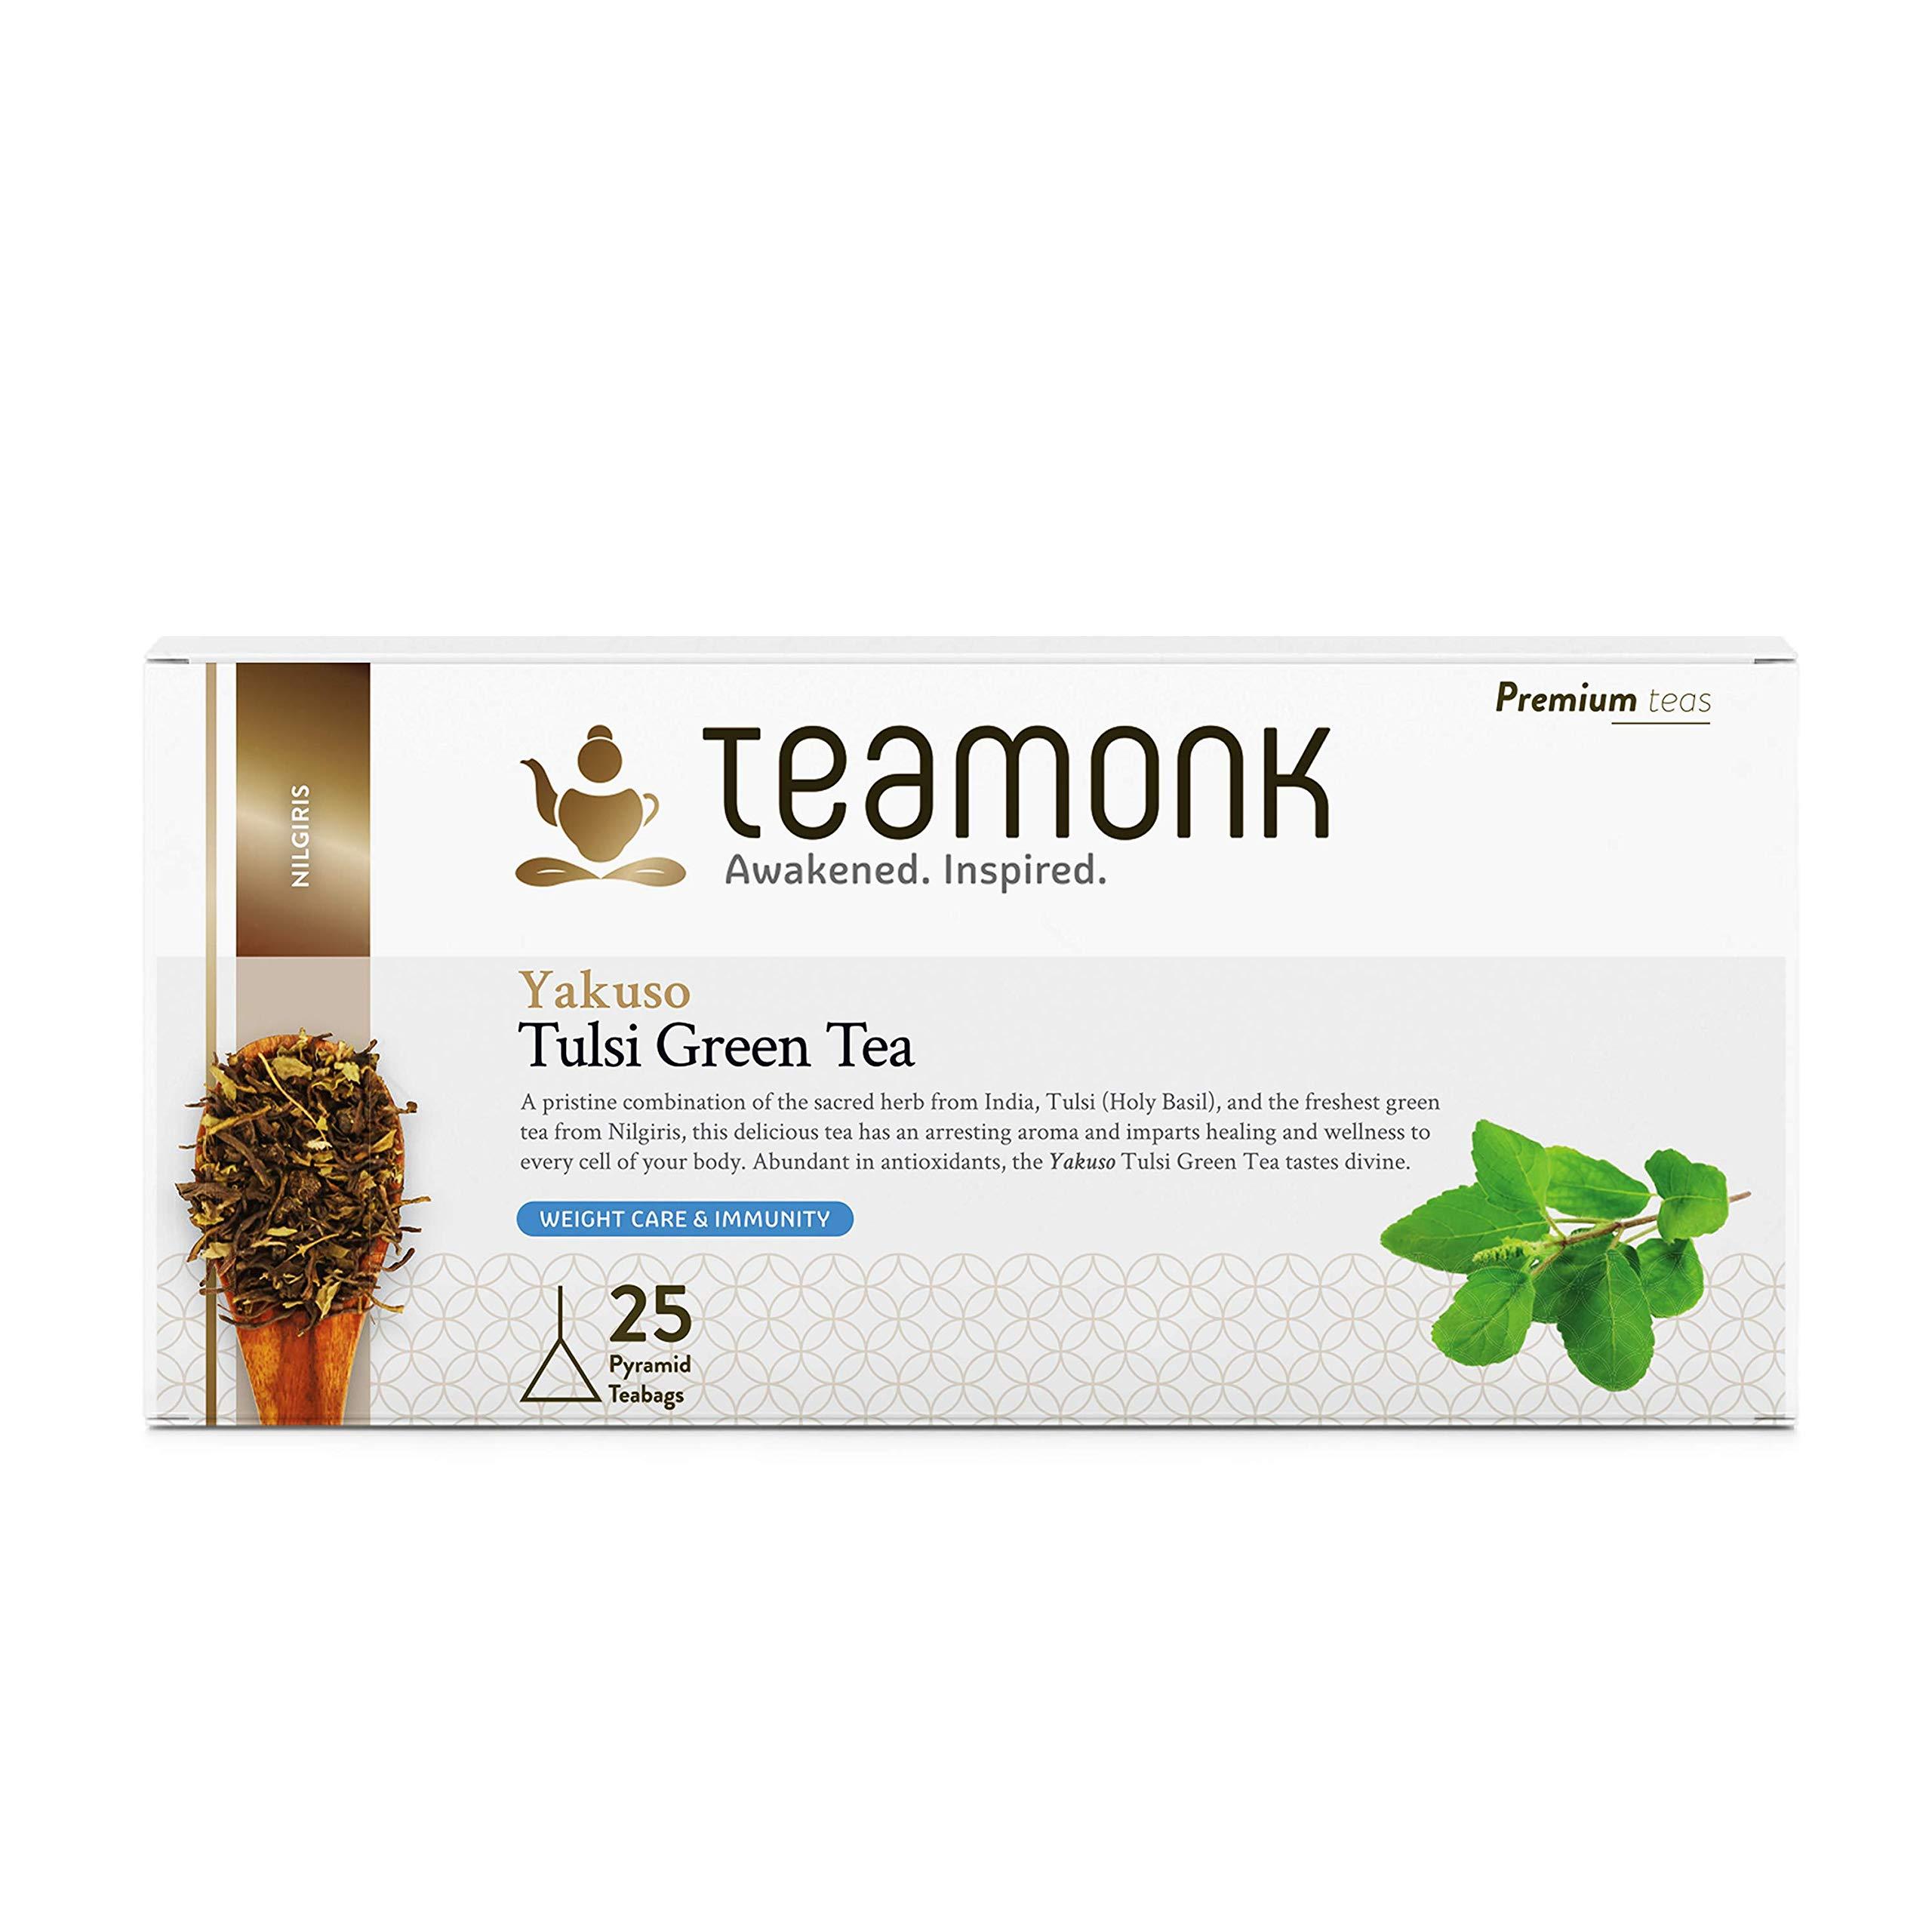 Teamonk Yakuso Holy Basil Tulsi Green Tea Bags - 25 Tea Bags | Tulsi Tea Bags for Weight Loss | Slimming Tea Bags | Ayurvedic Holy Basil Tea | 100% Pure Natural Tulsi Tea | No Additives